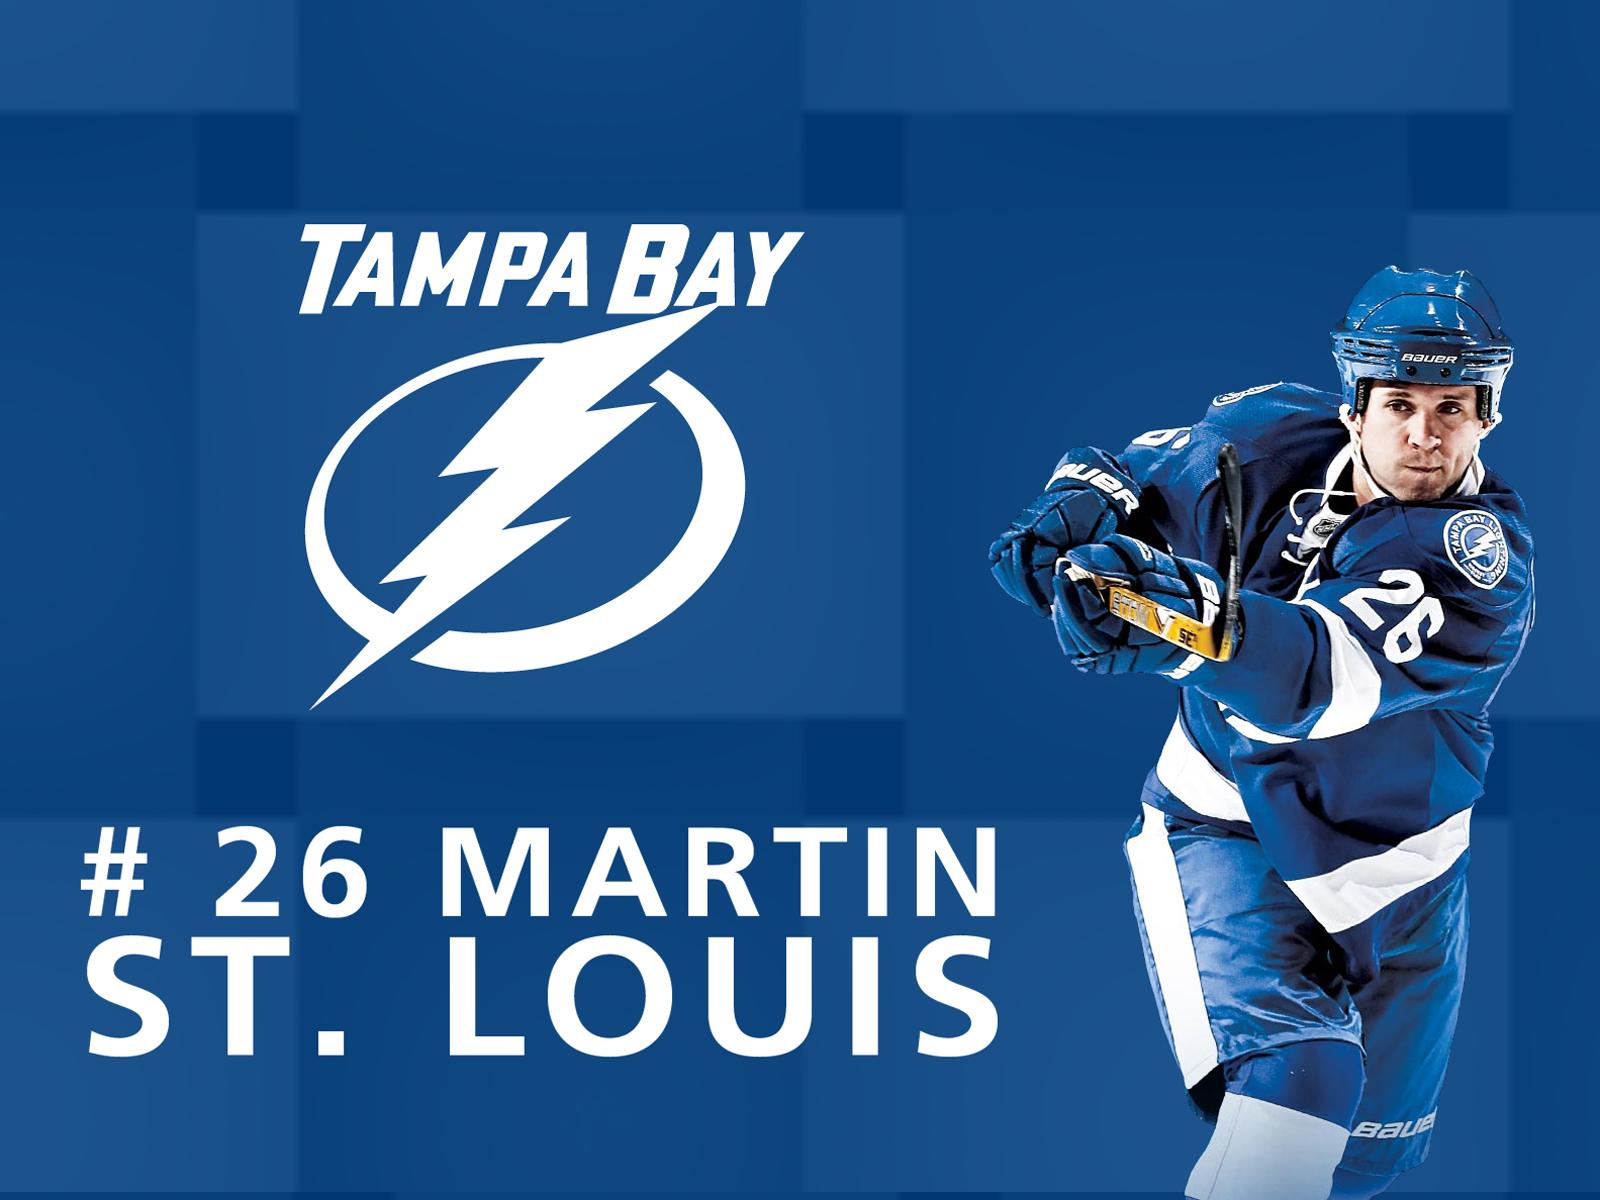 Martin St Louis Wallpaper Tampa Bay Lightning Wallpaper